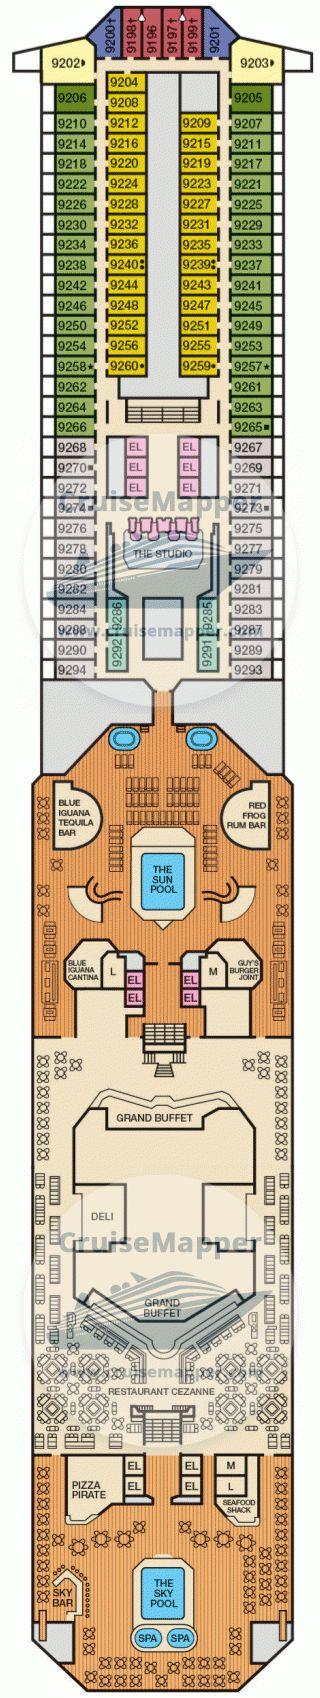 Carnival Conquest Deck 09 - Lido-Pool